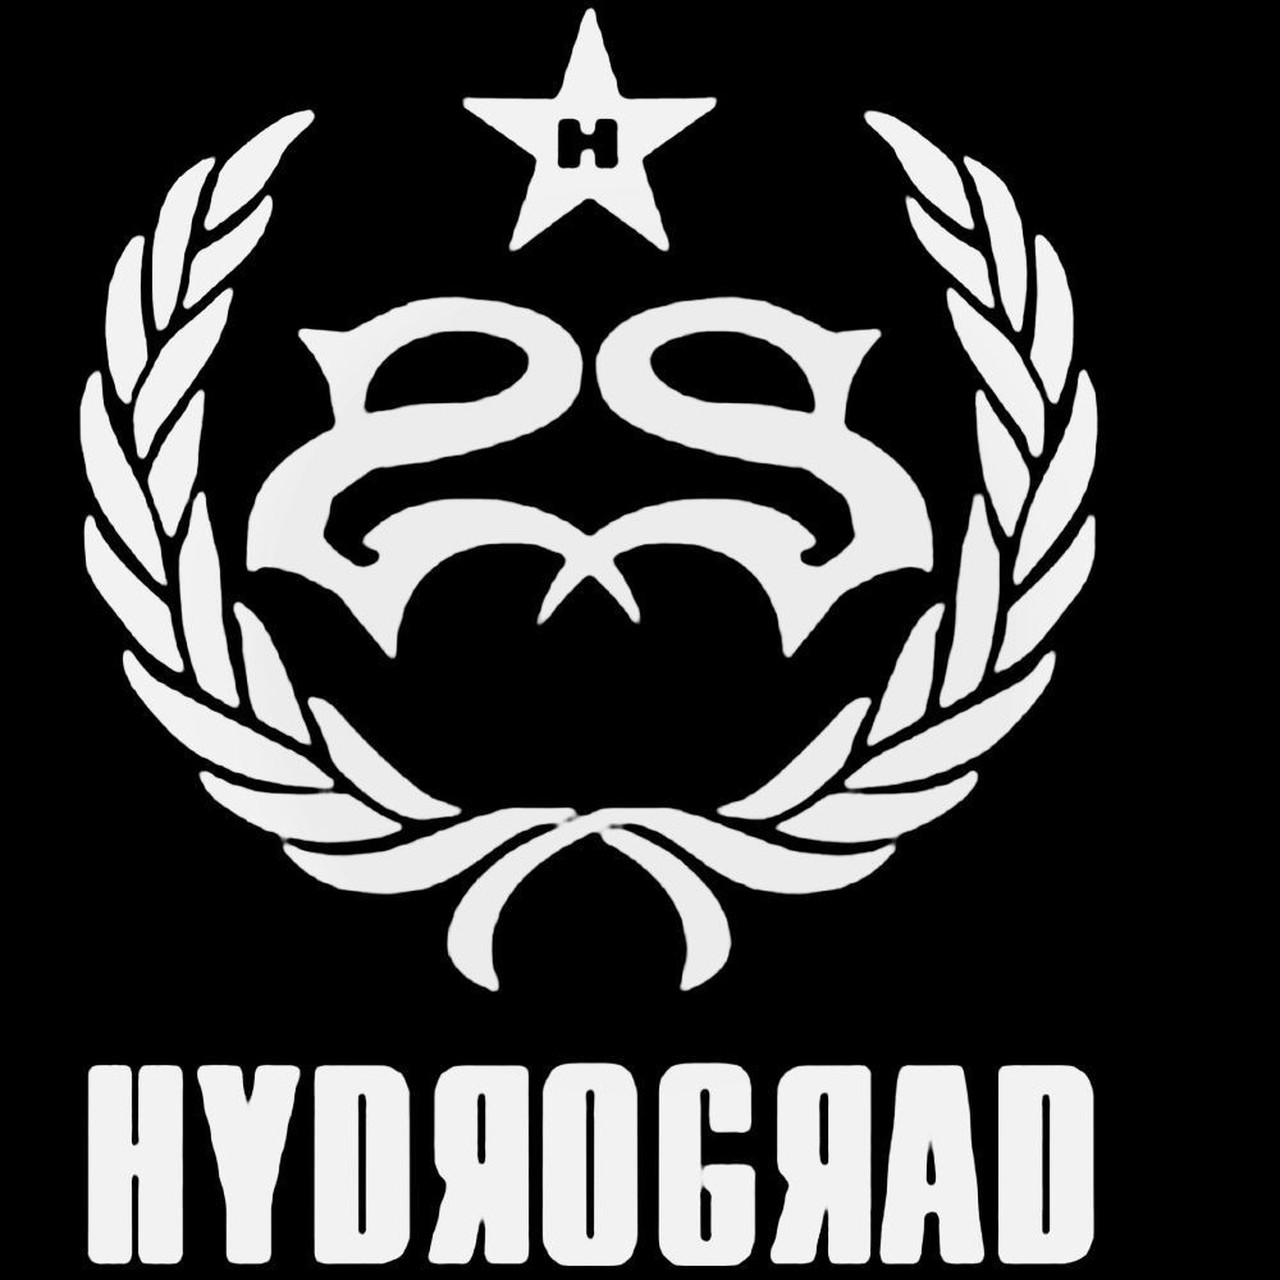 Stone Sour Hydrograd Decal Sticker.